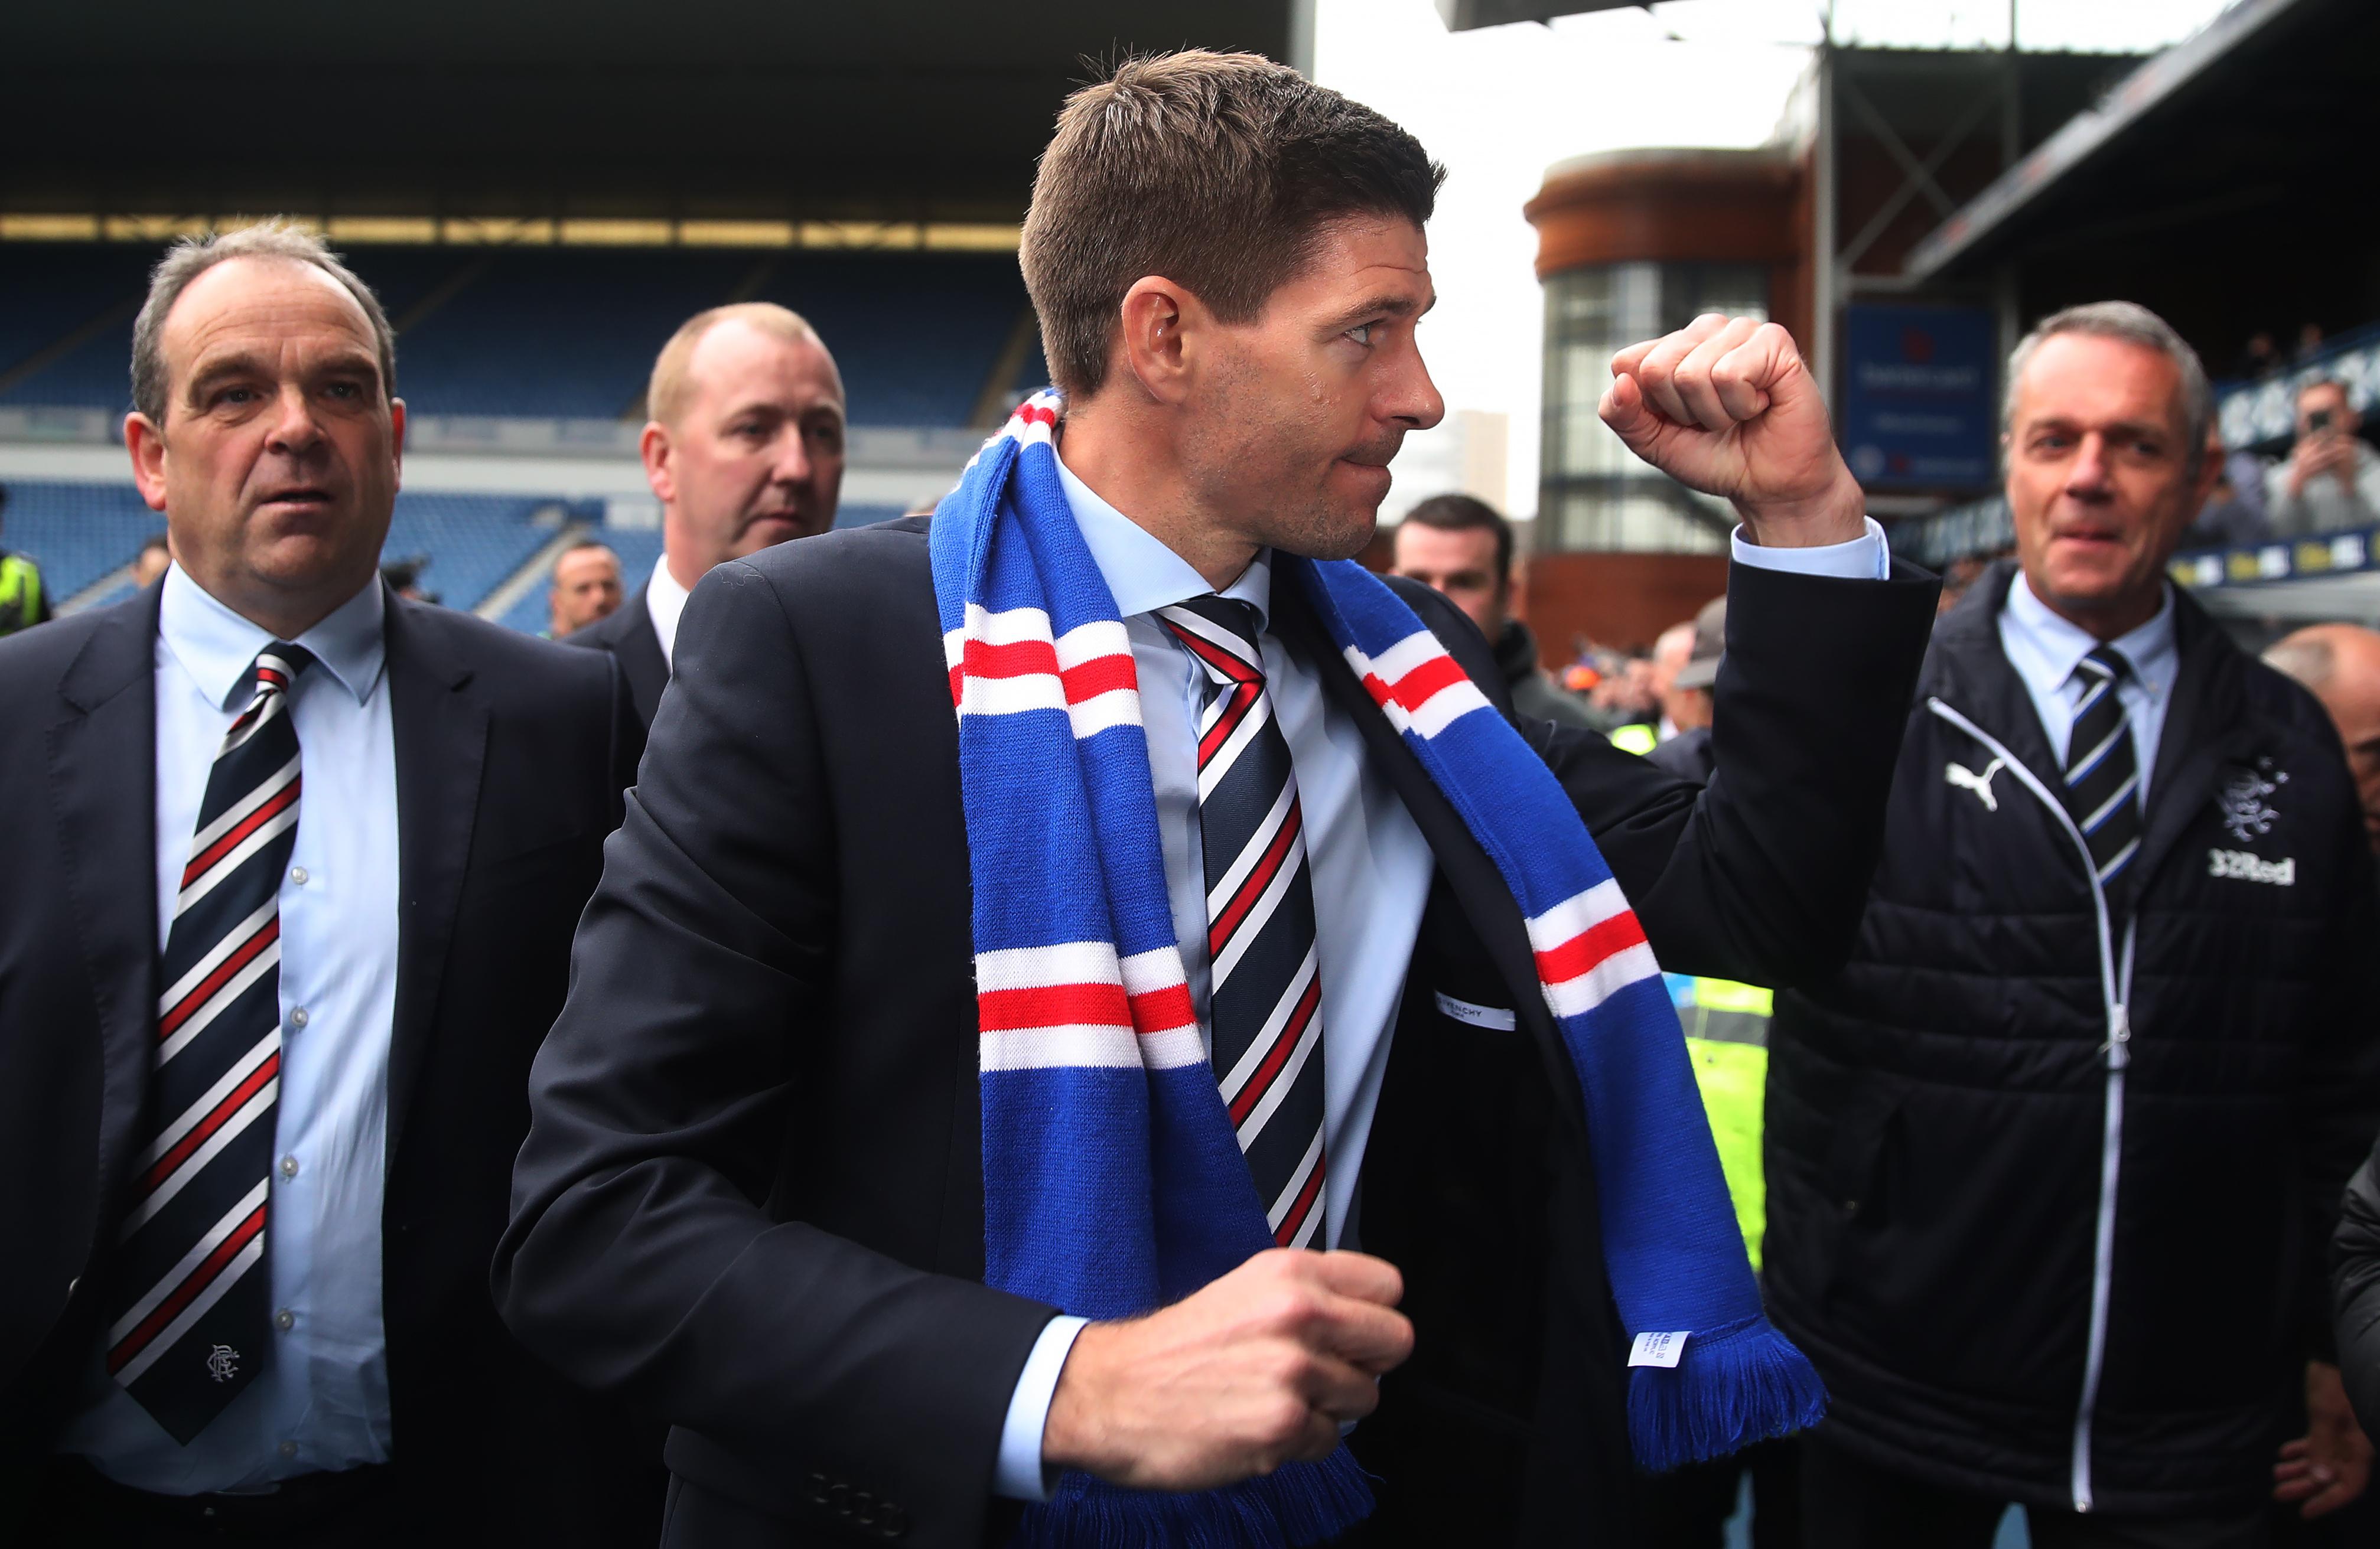 Rangers de Escocia, Steven Gerrard, Se Une, Eduardo Herrera, Entrenador, Escocia, Futbolista, Ingles, Lalo